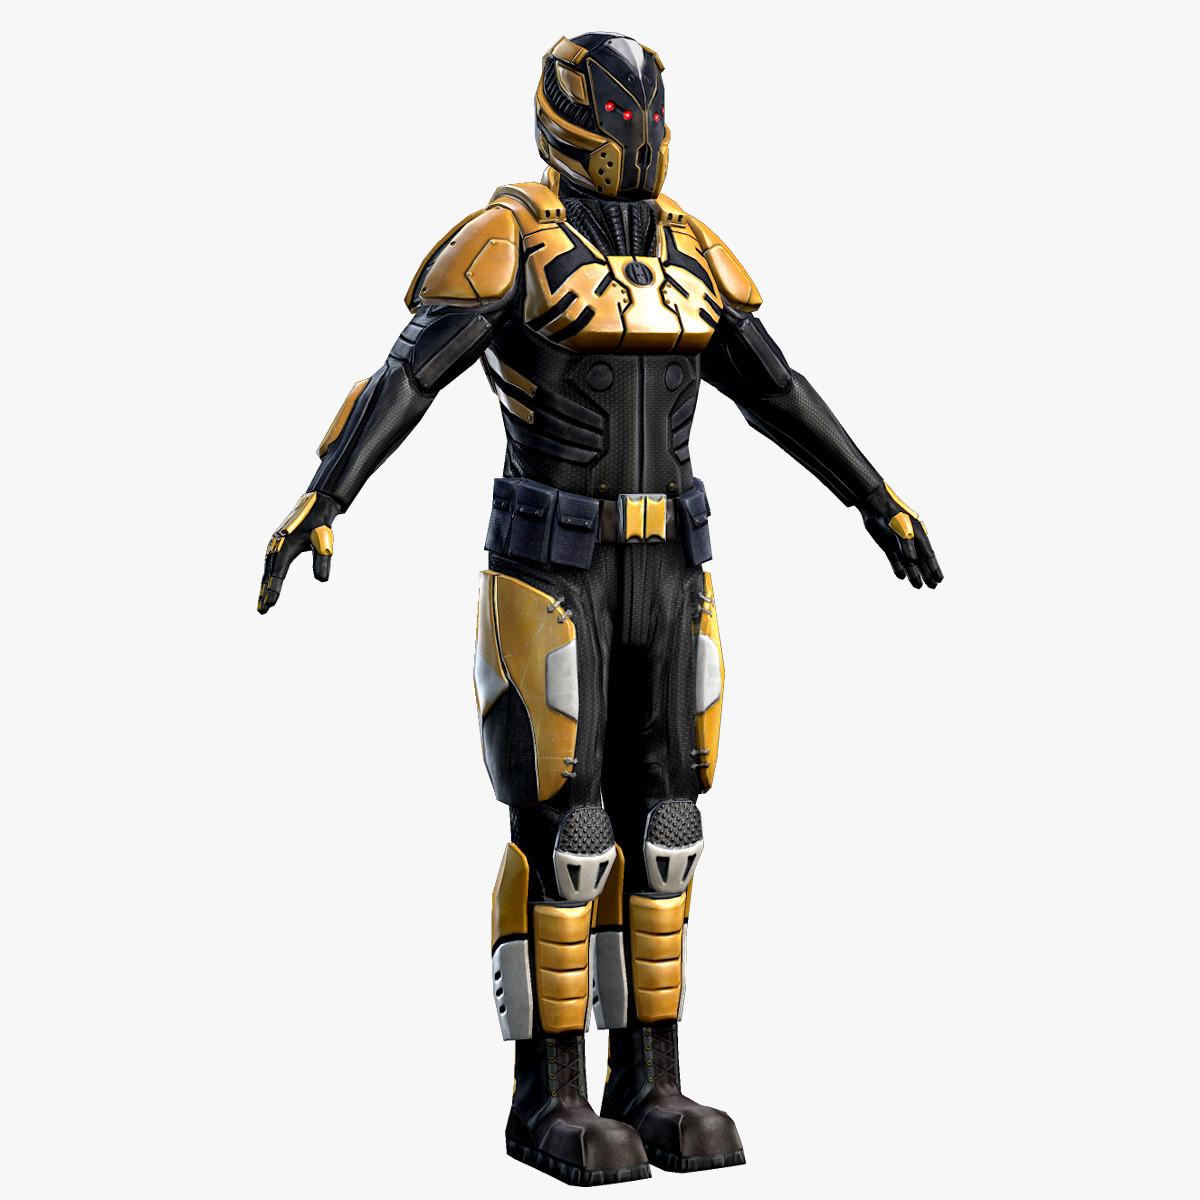 armor_01.jpg